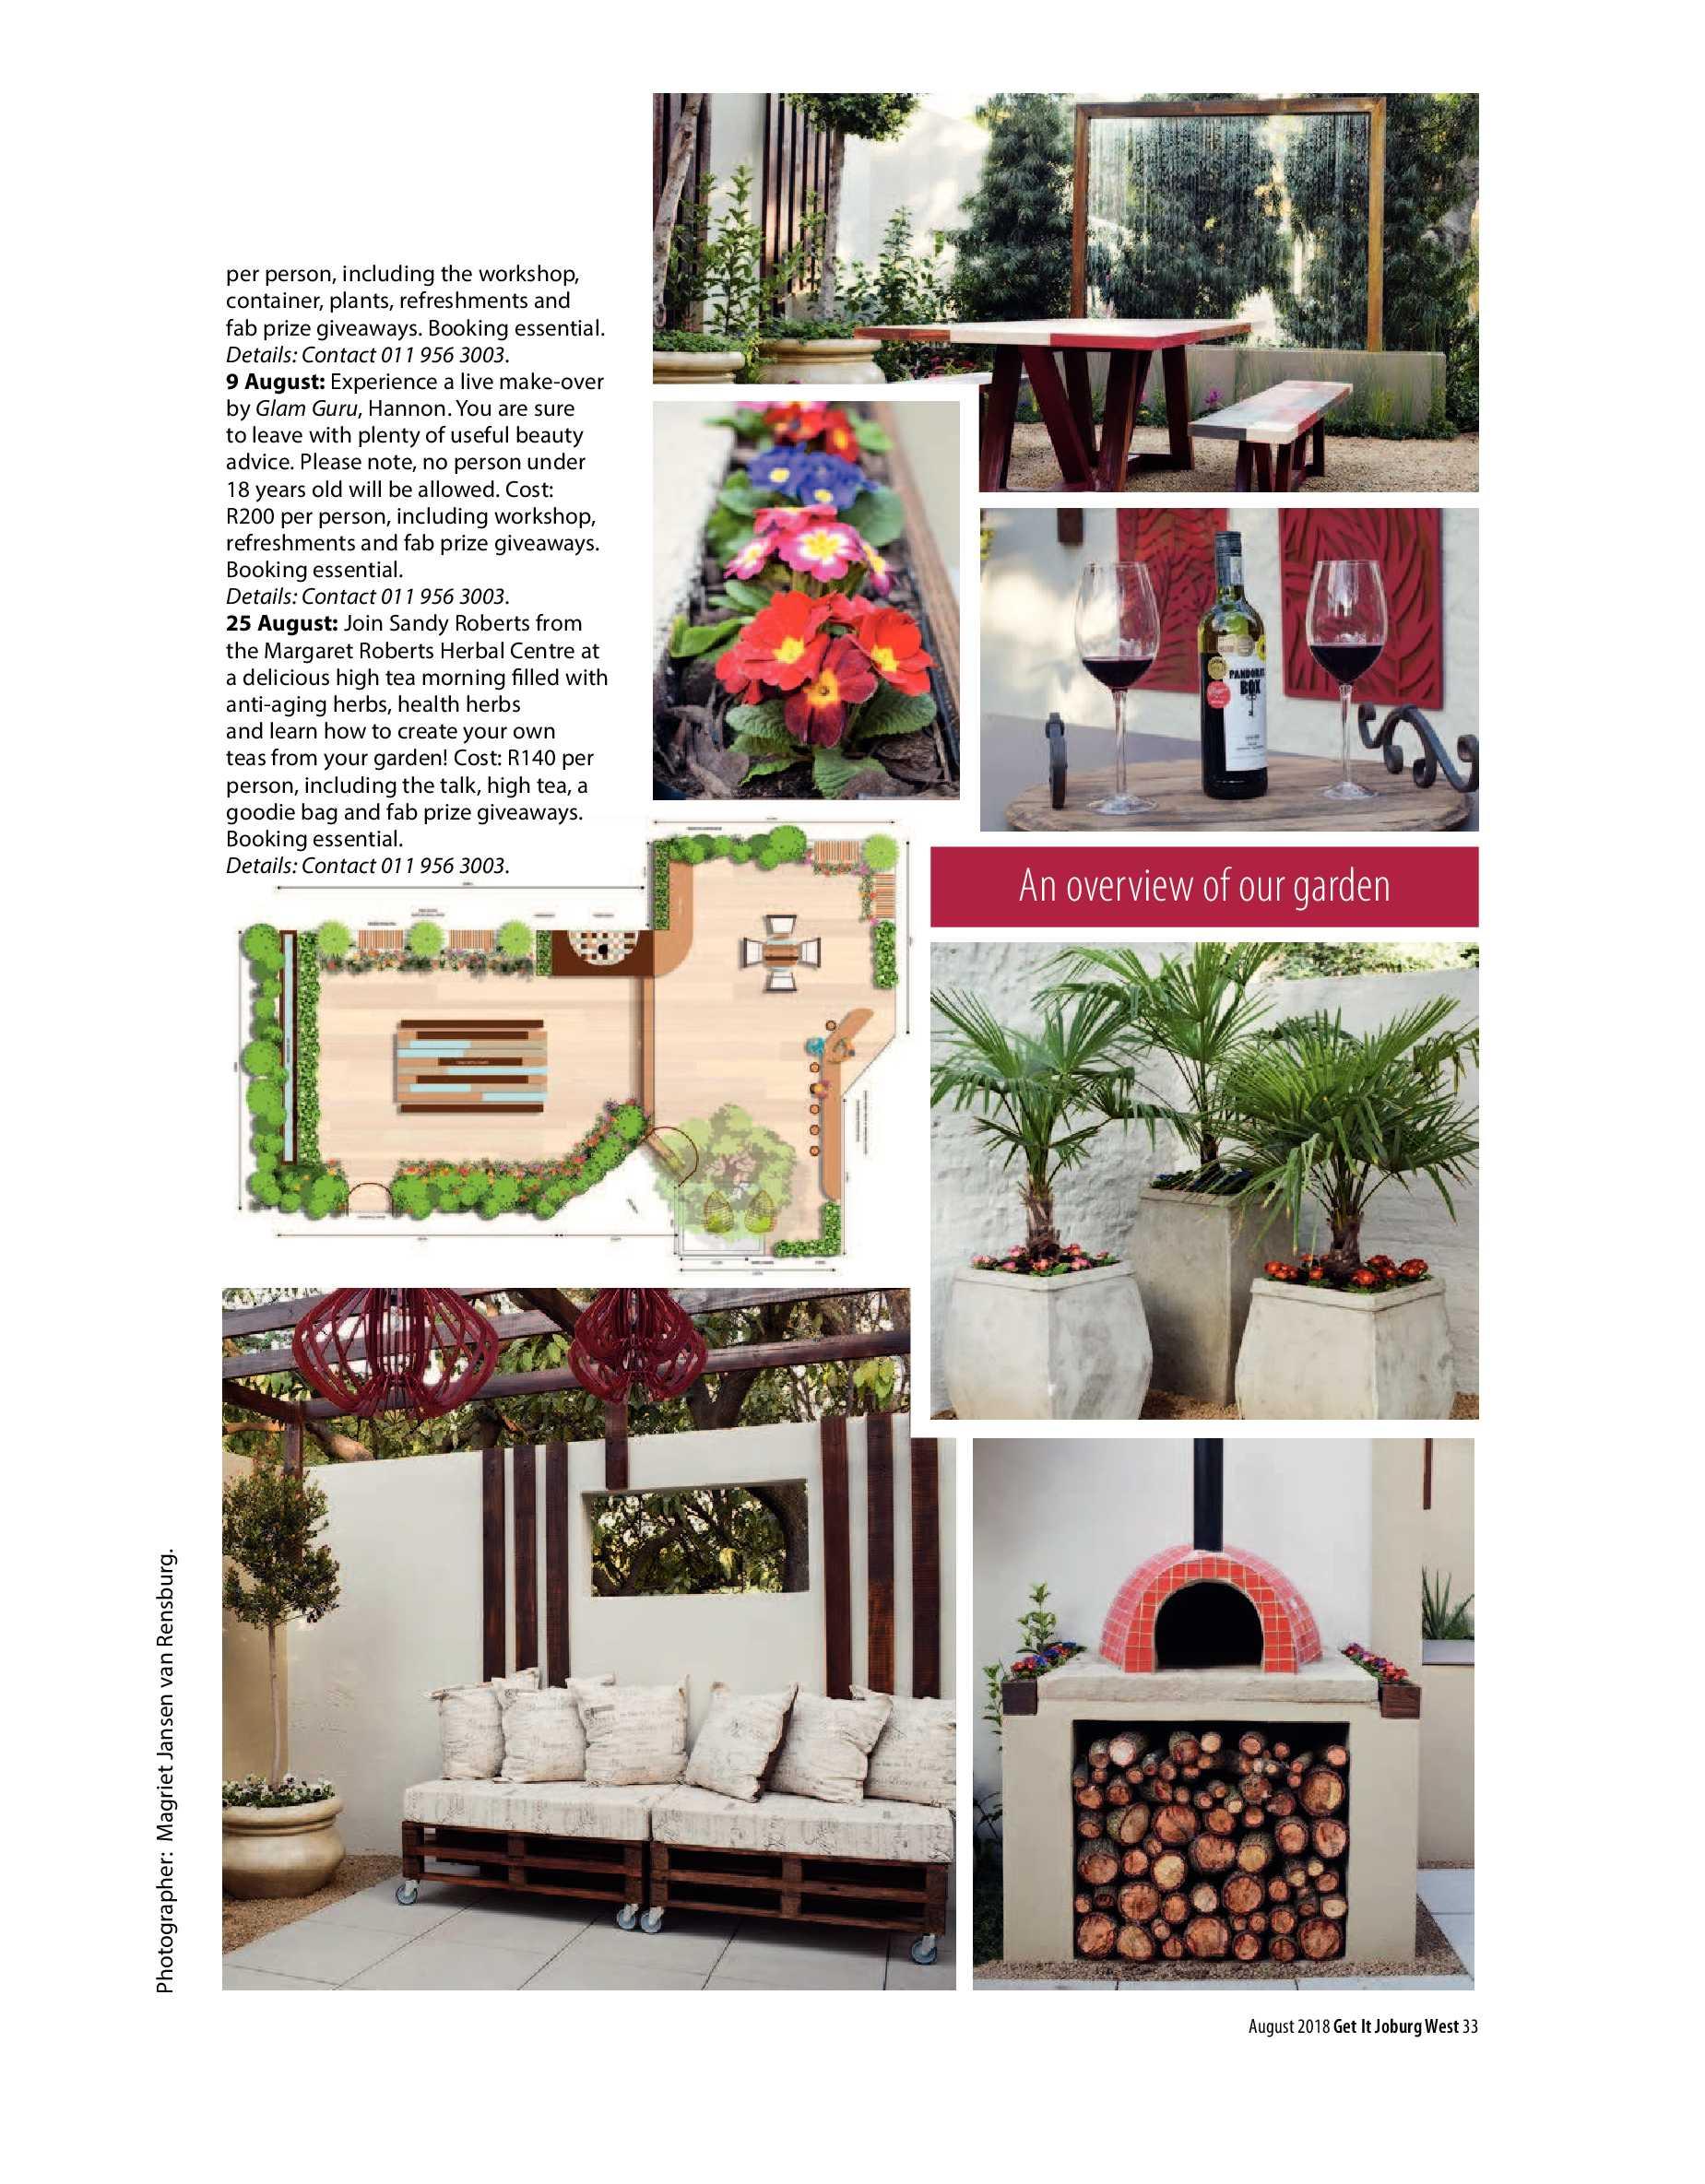 getit-joburg-west-august-2018-epapers-page-33